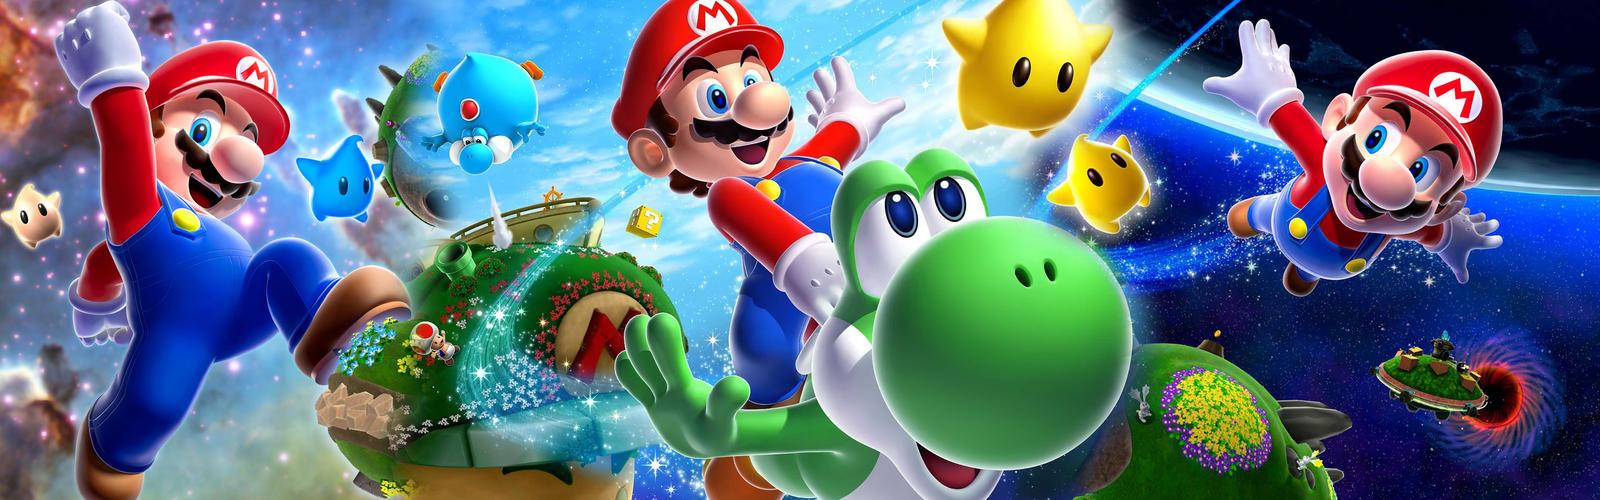 Super Mario Galaxy 2 Wallpaper by Toxigyn